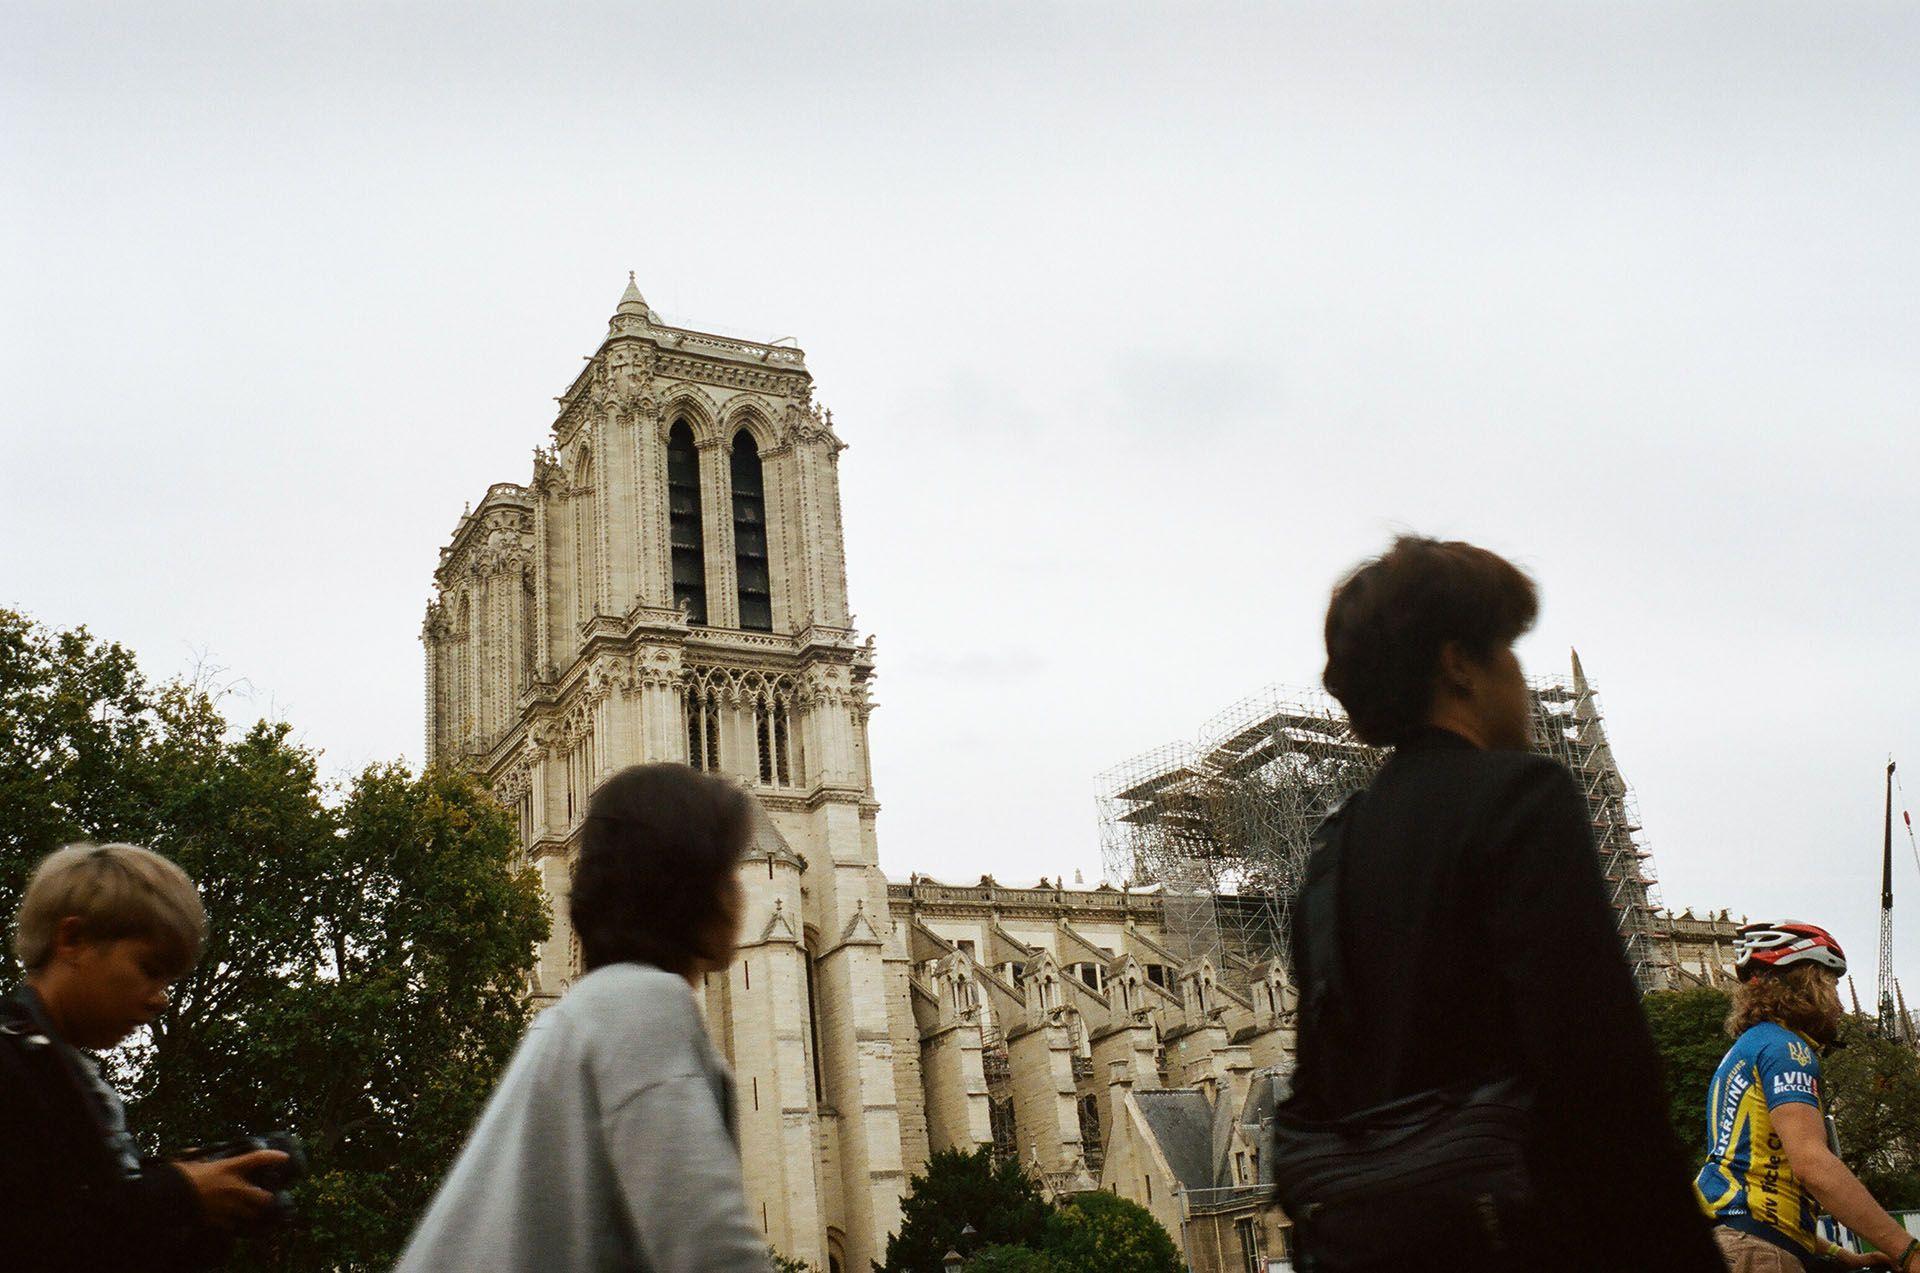 Нотр-Дам де Парі